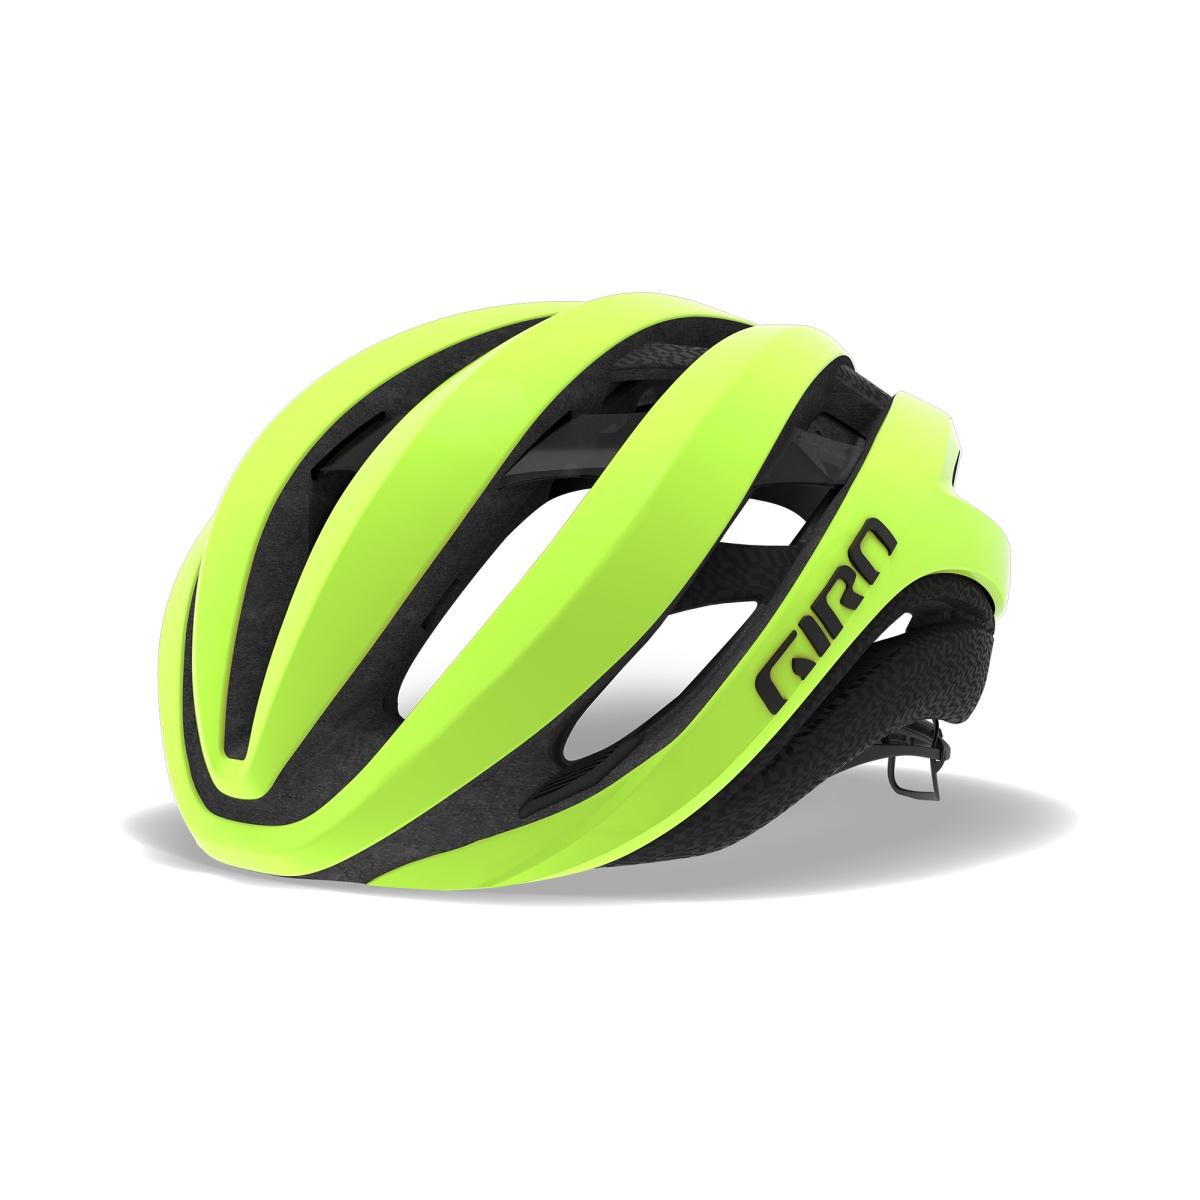 Giro Aether MIPS Spherical helmet launched